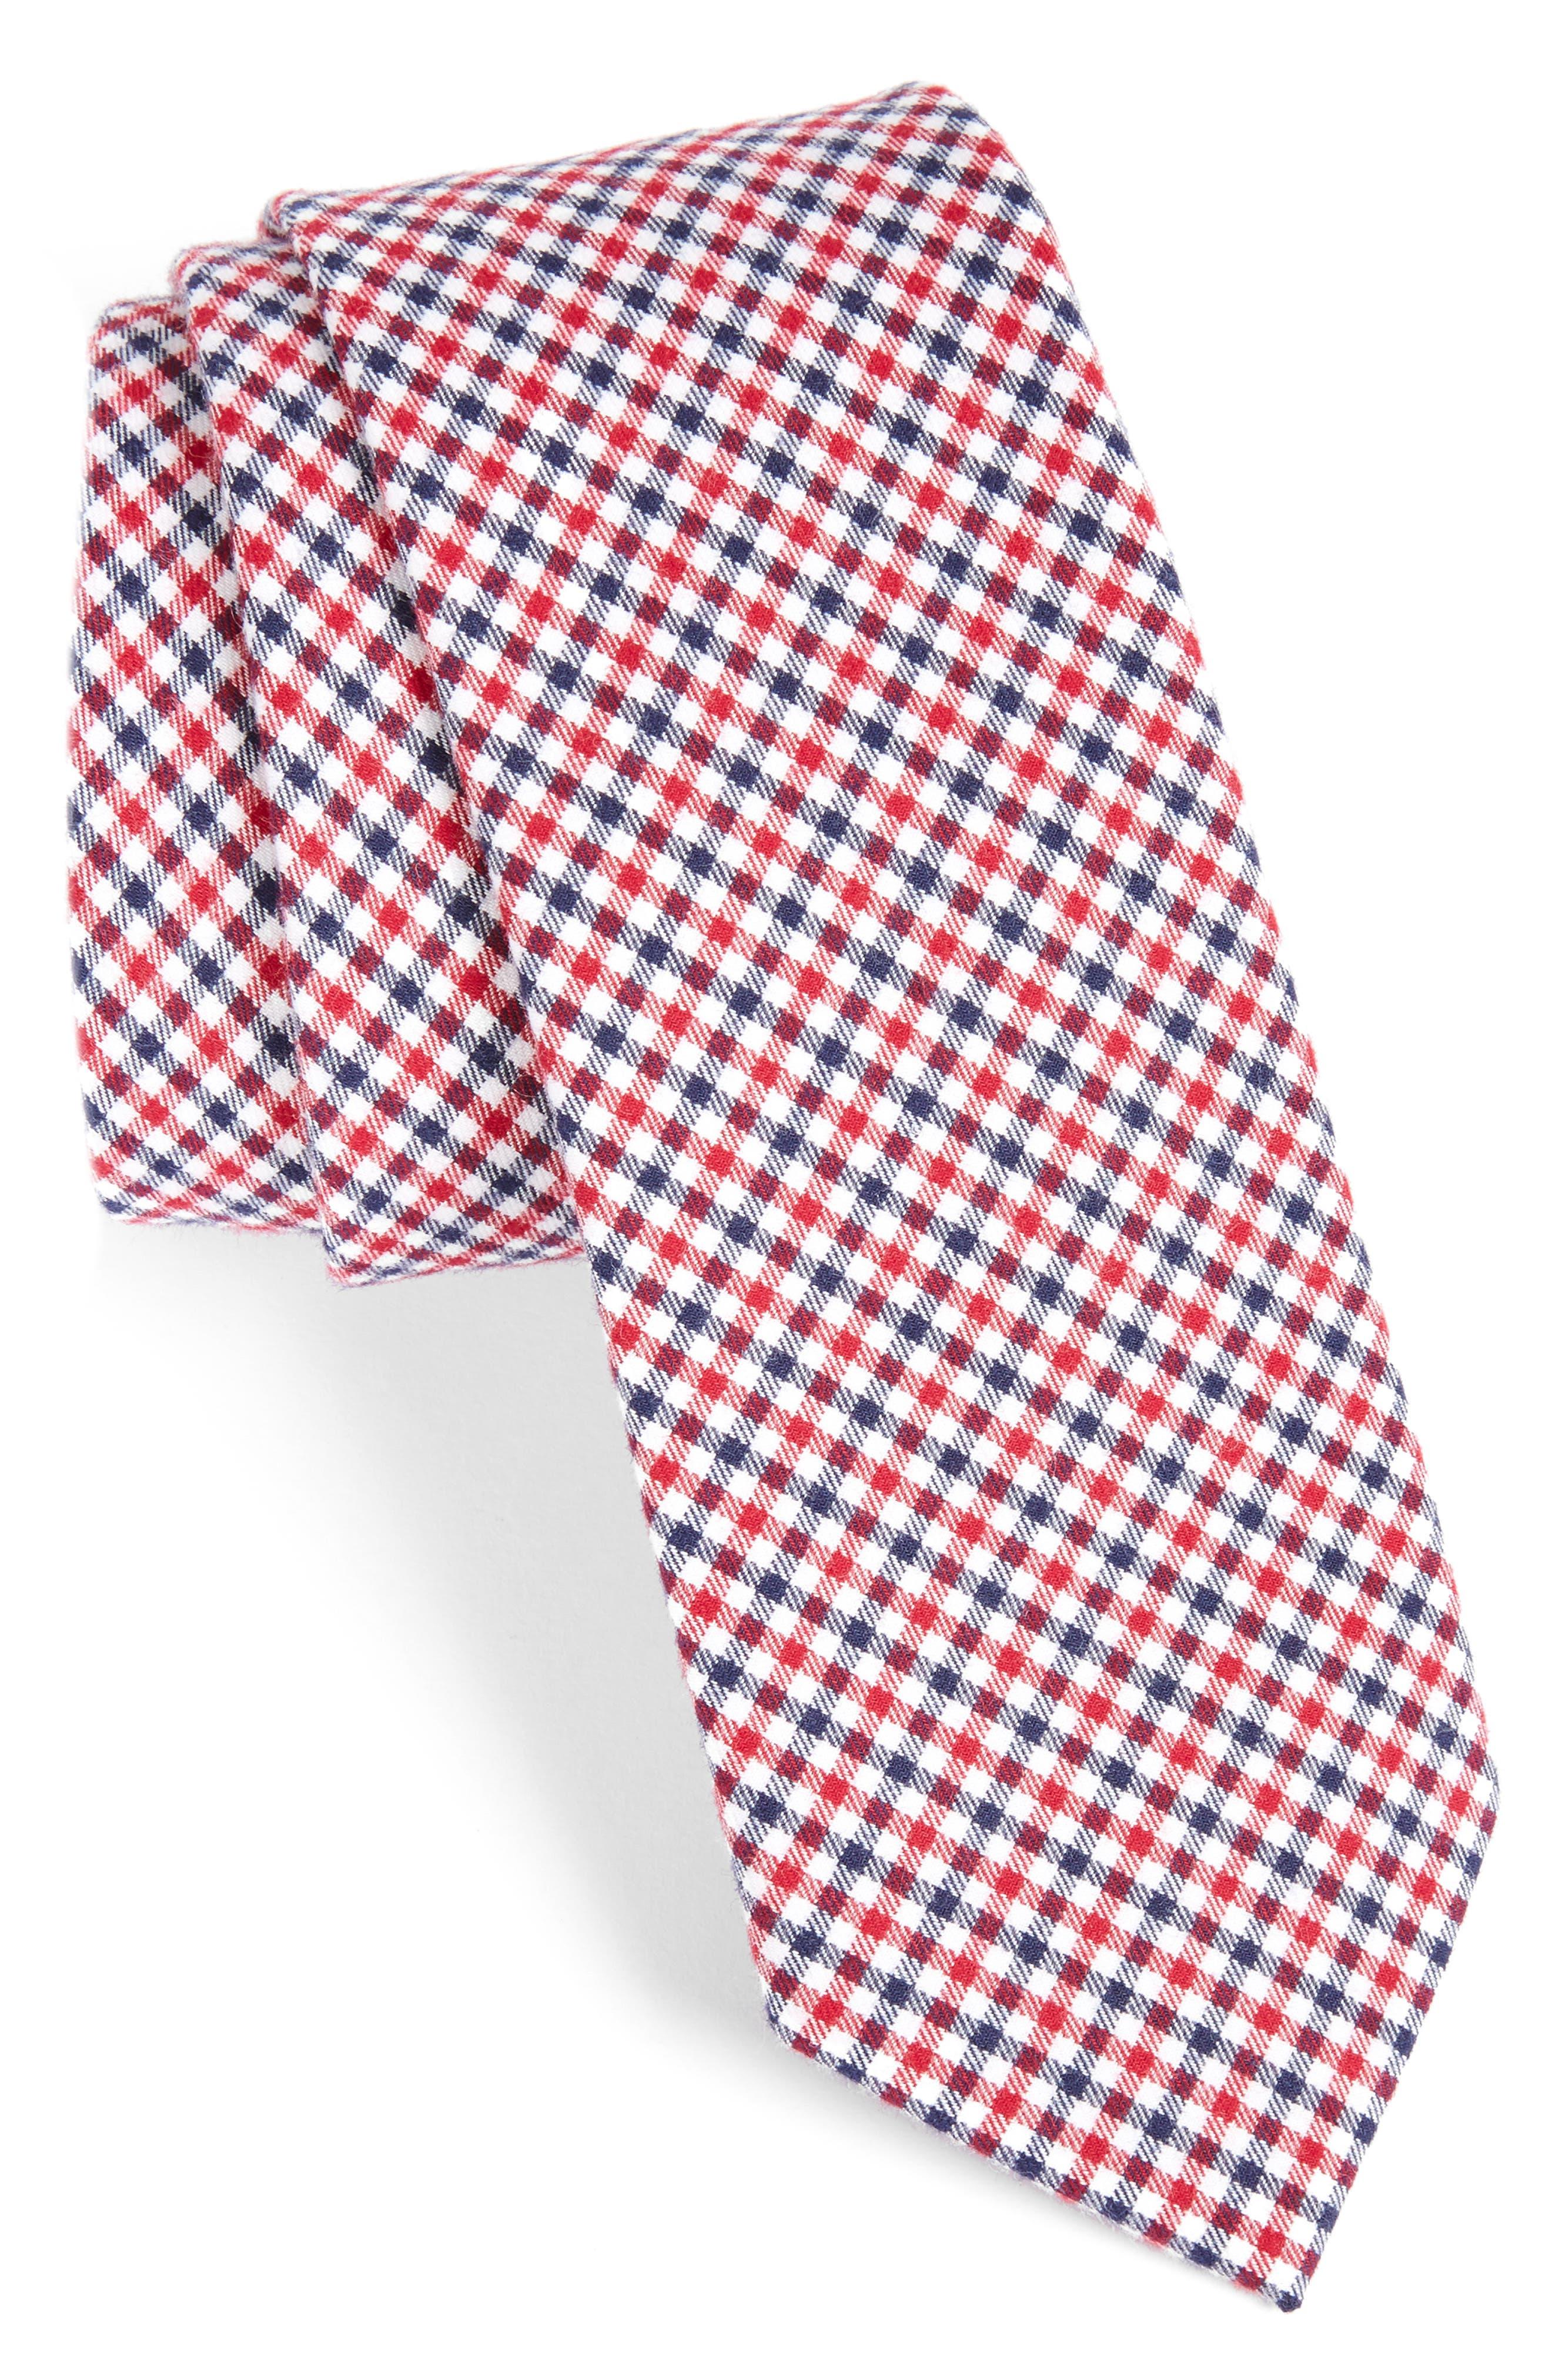 Main Image - 1901 Plaid Cotton Tie